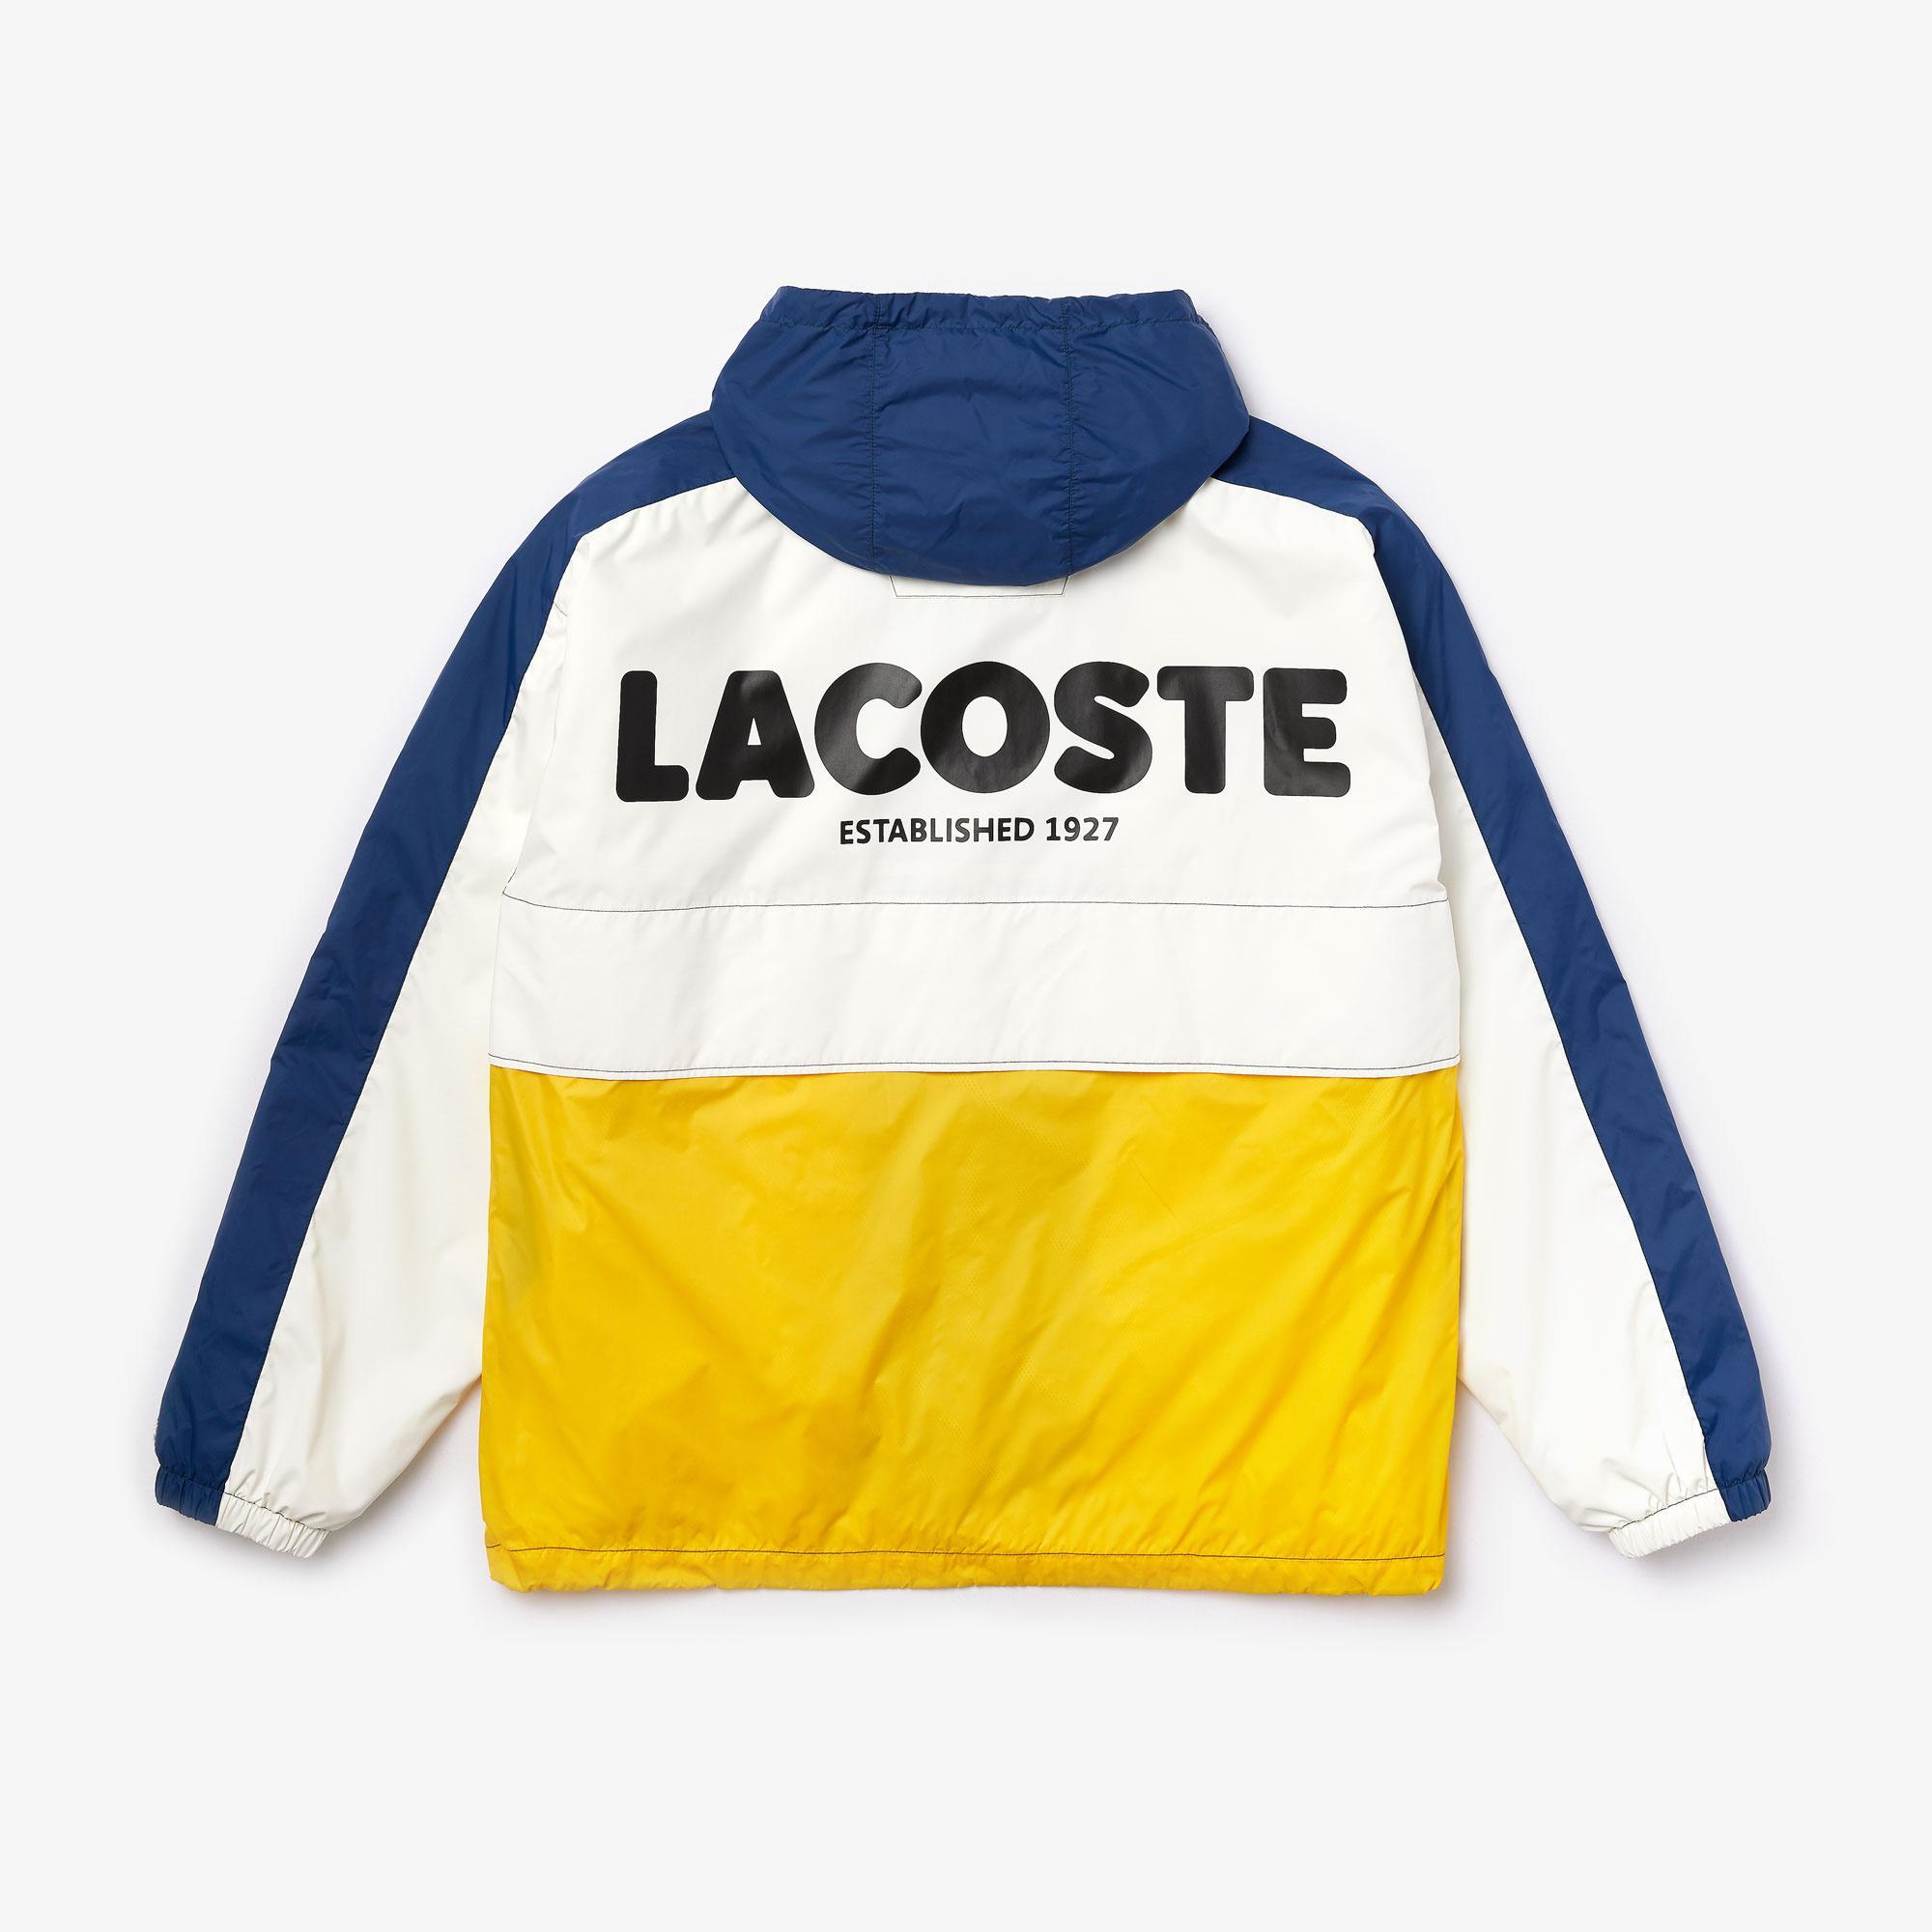 Lacoste Unisex LIVE Hooded Zippered Colorblock Windbreaker